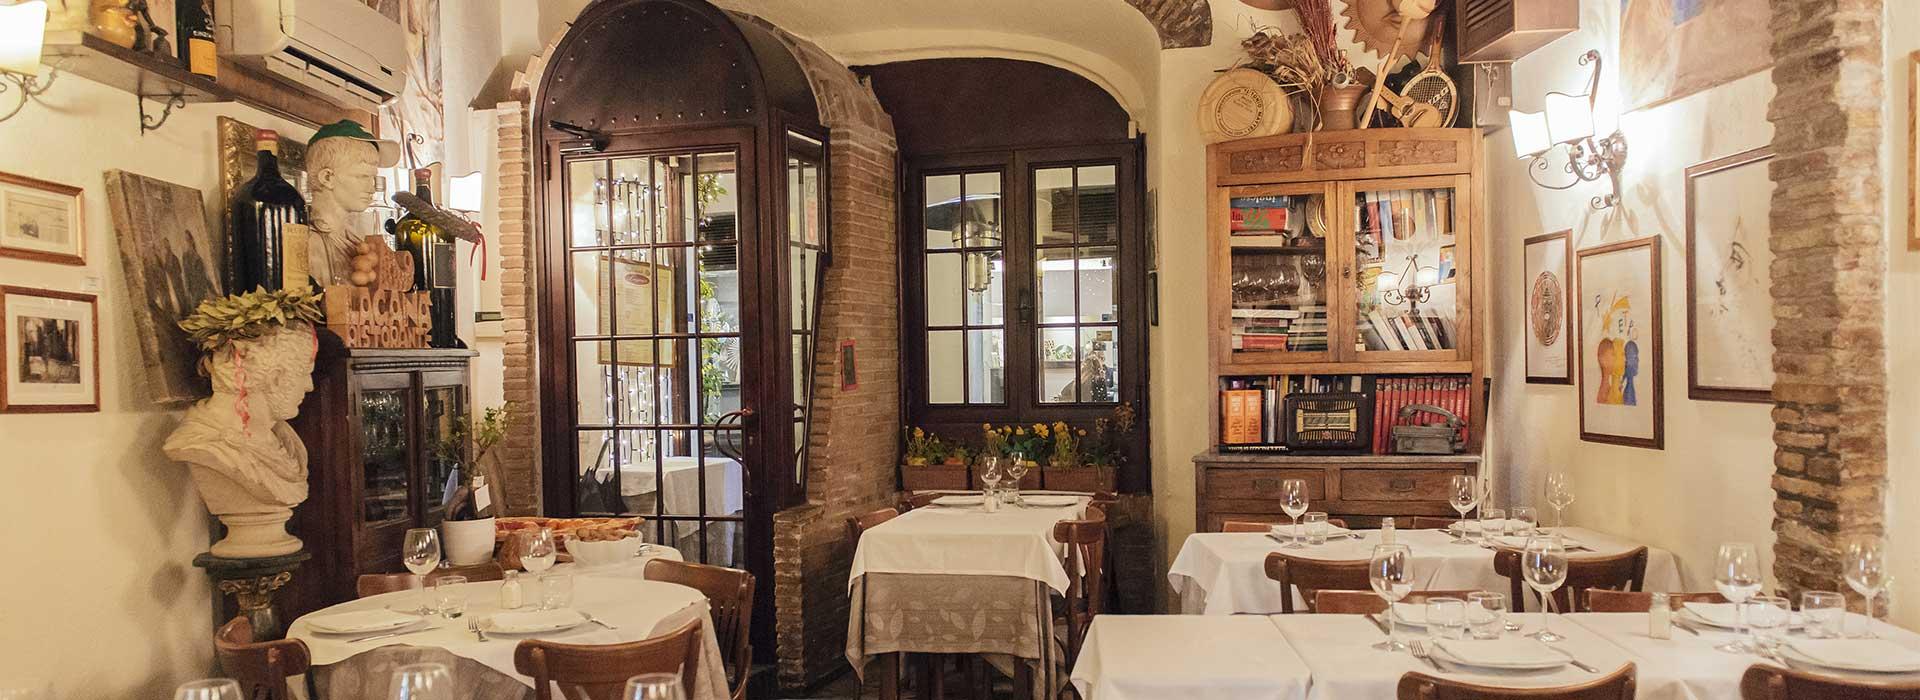 Restaurante vegetariano en Roma